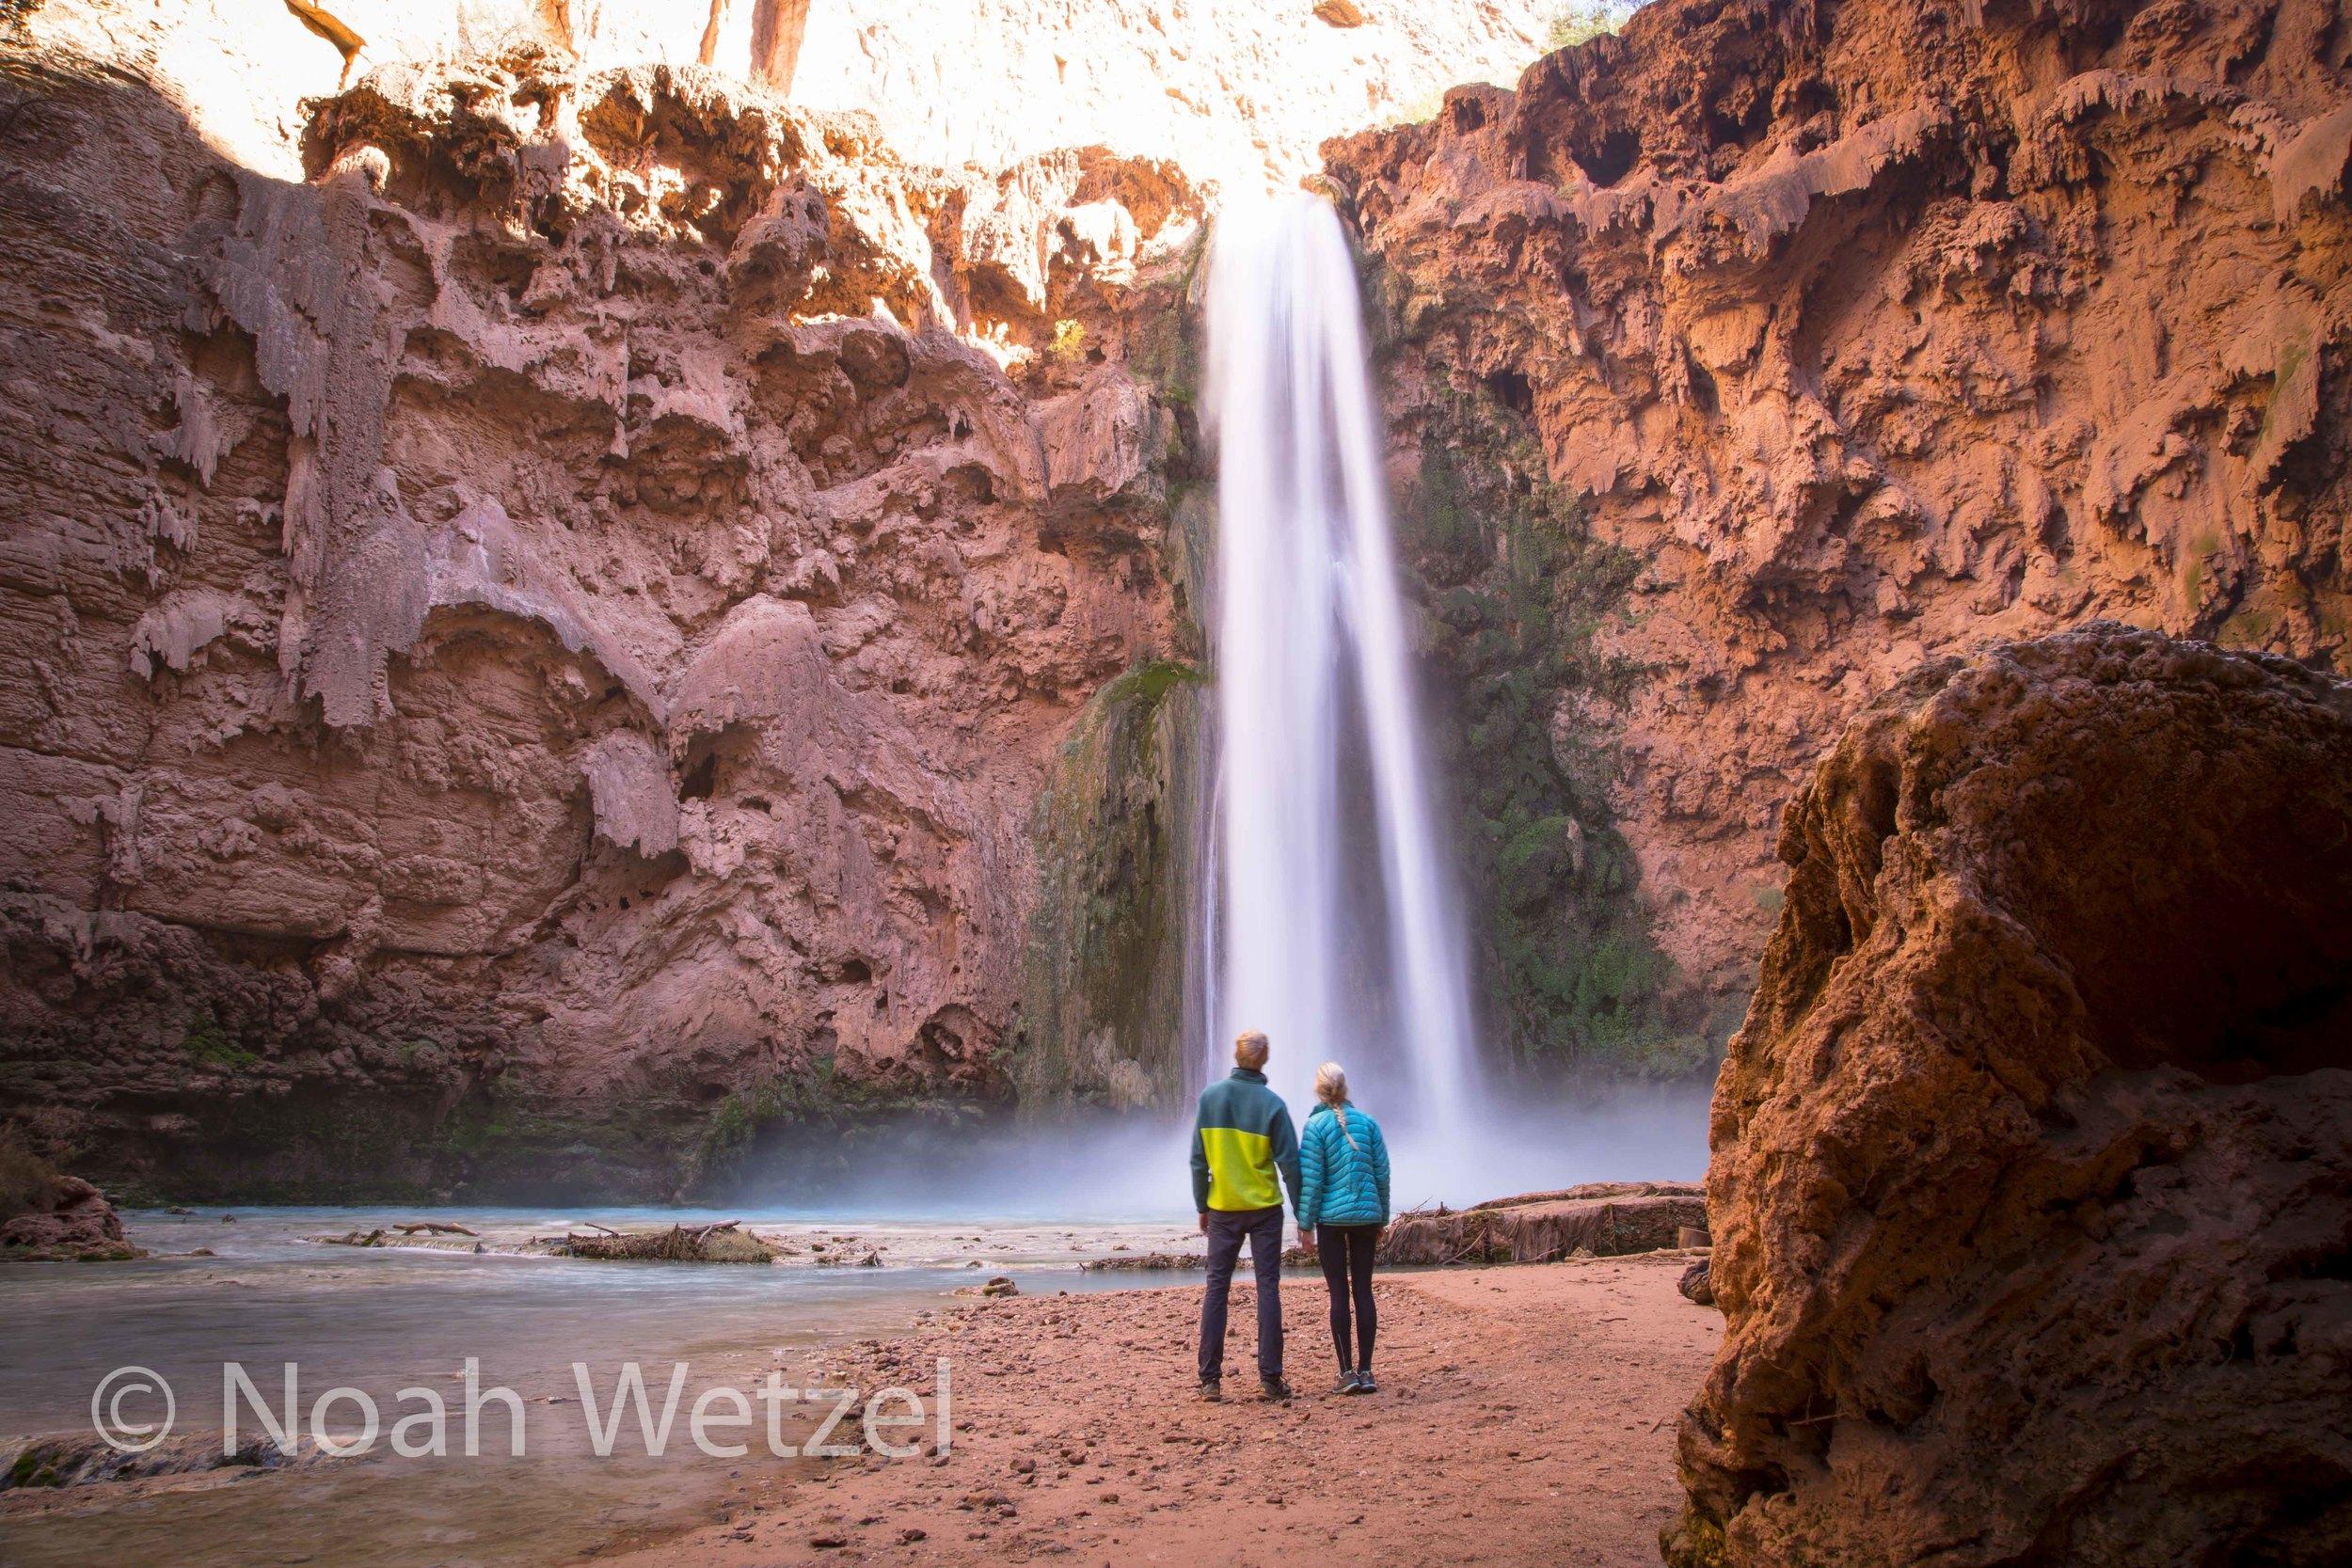 Jerome and Rachel soaking up Mooney Falls in Supai, Arizona